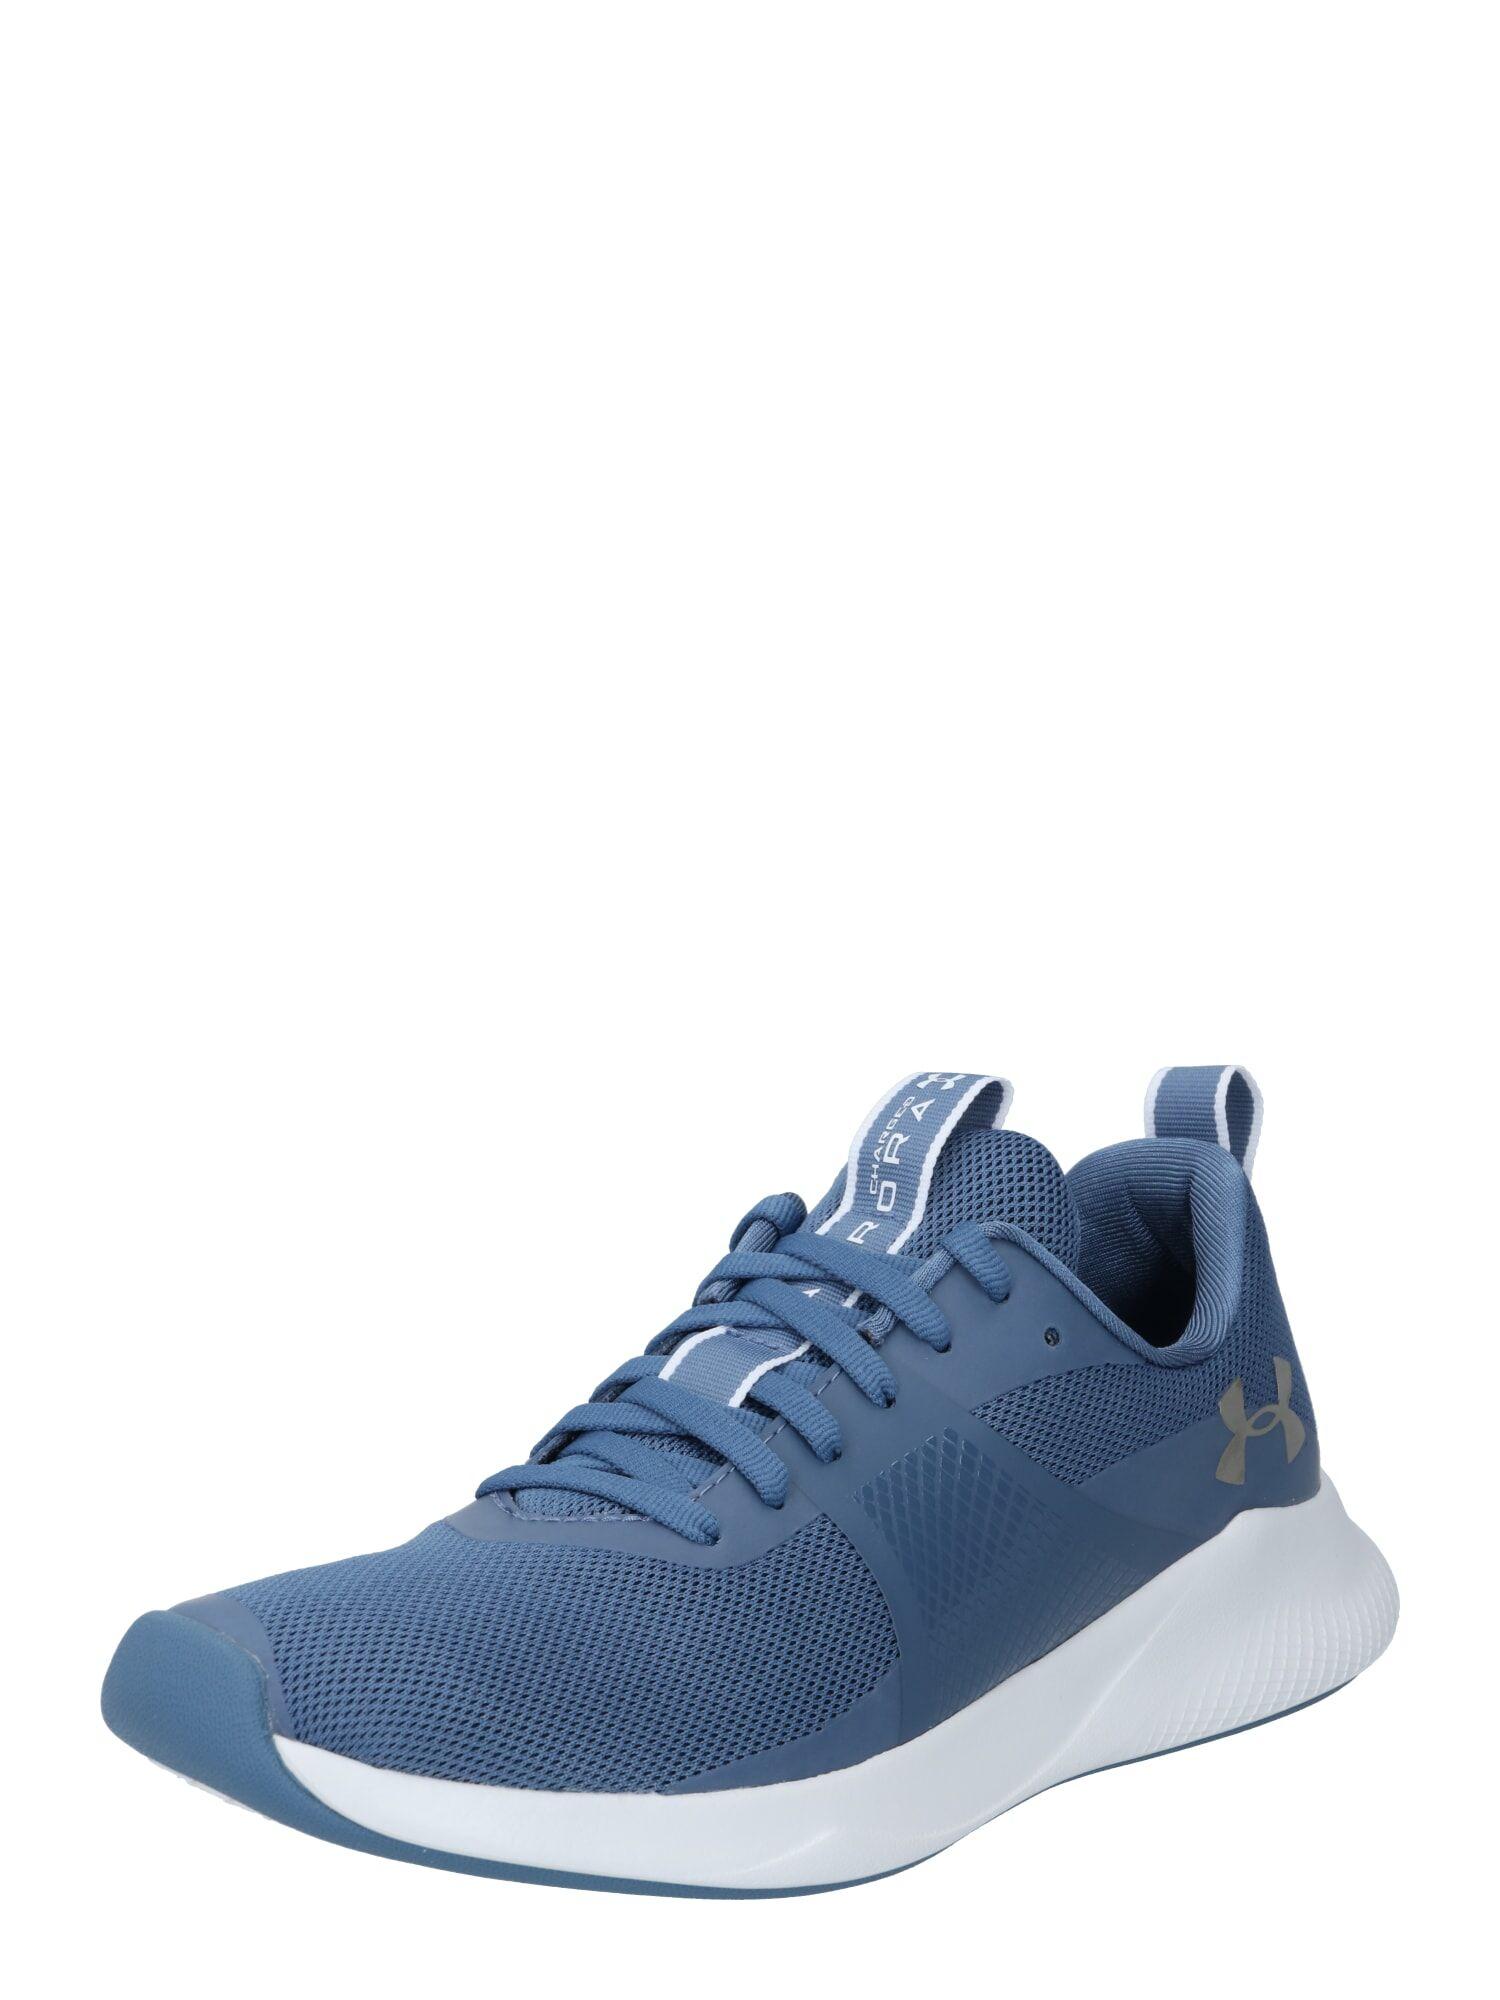 UNDER ARMOUR Chaussure de sport 'Aurora'  - Bleu - Taille: 9 - female